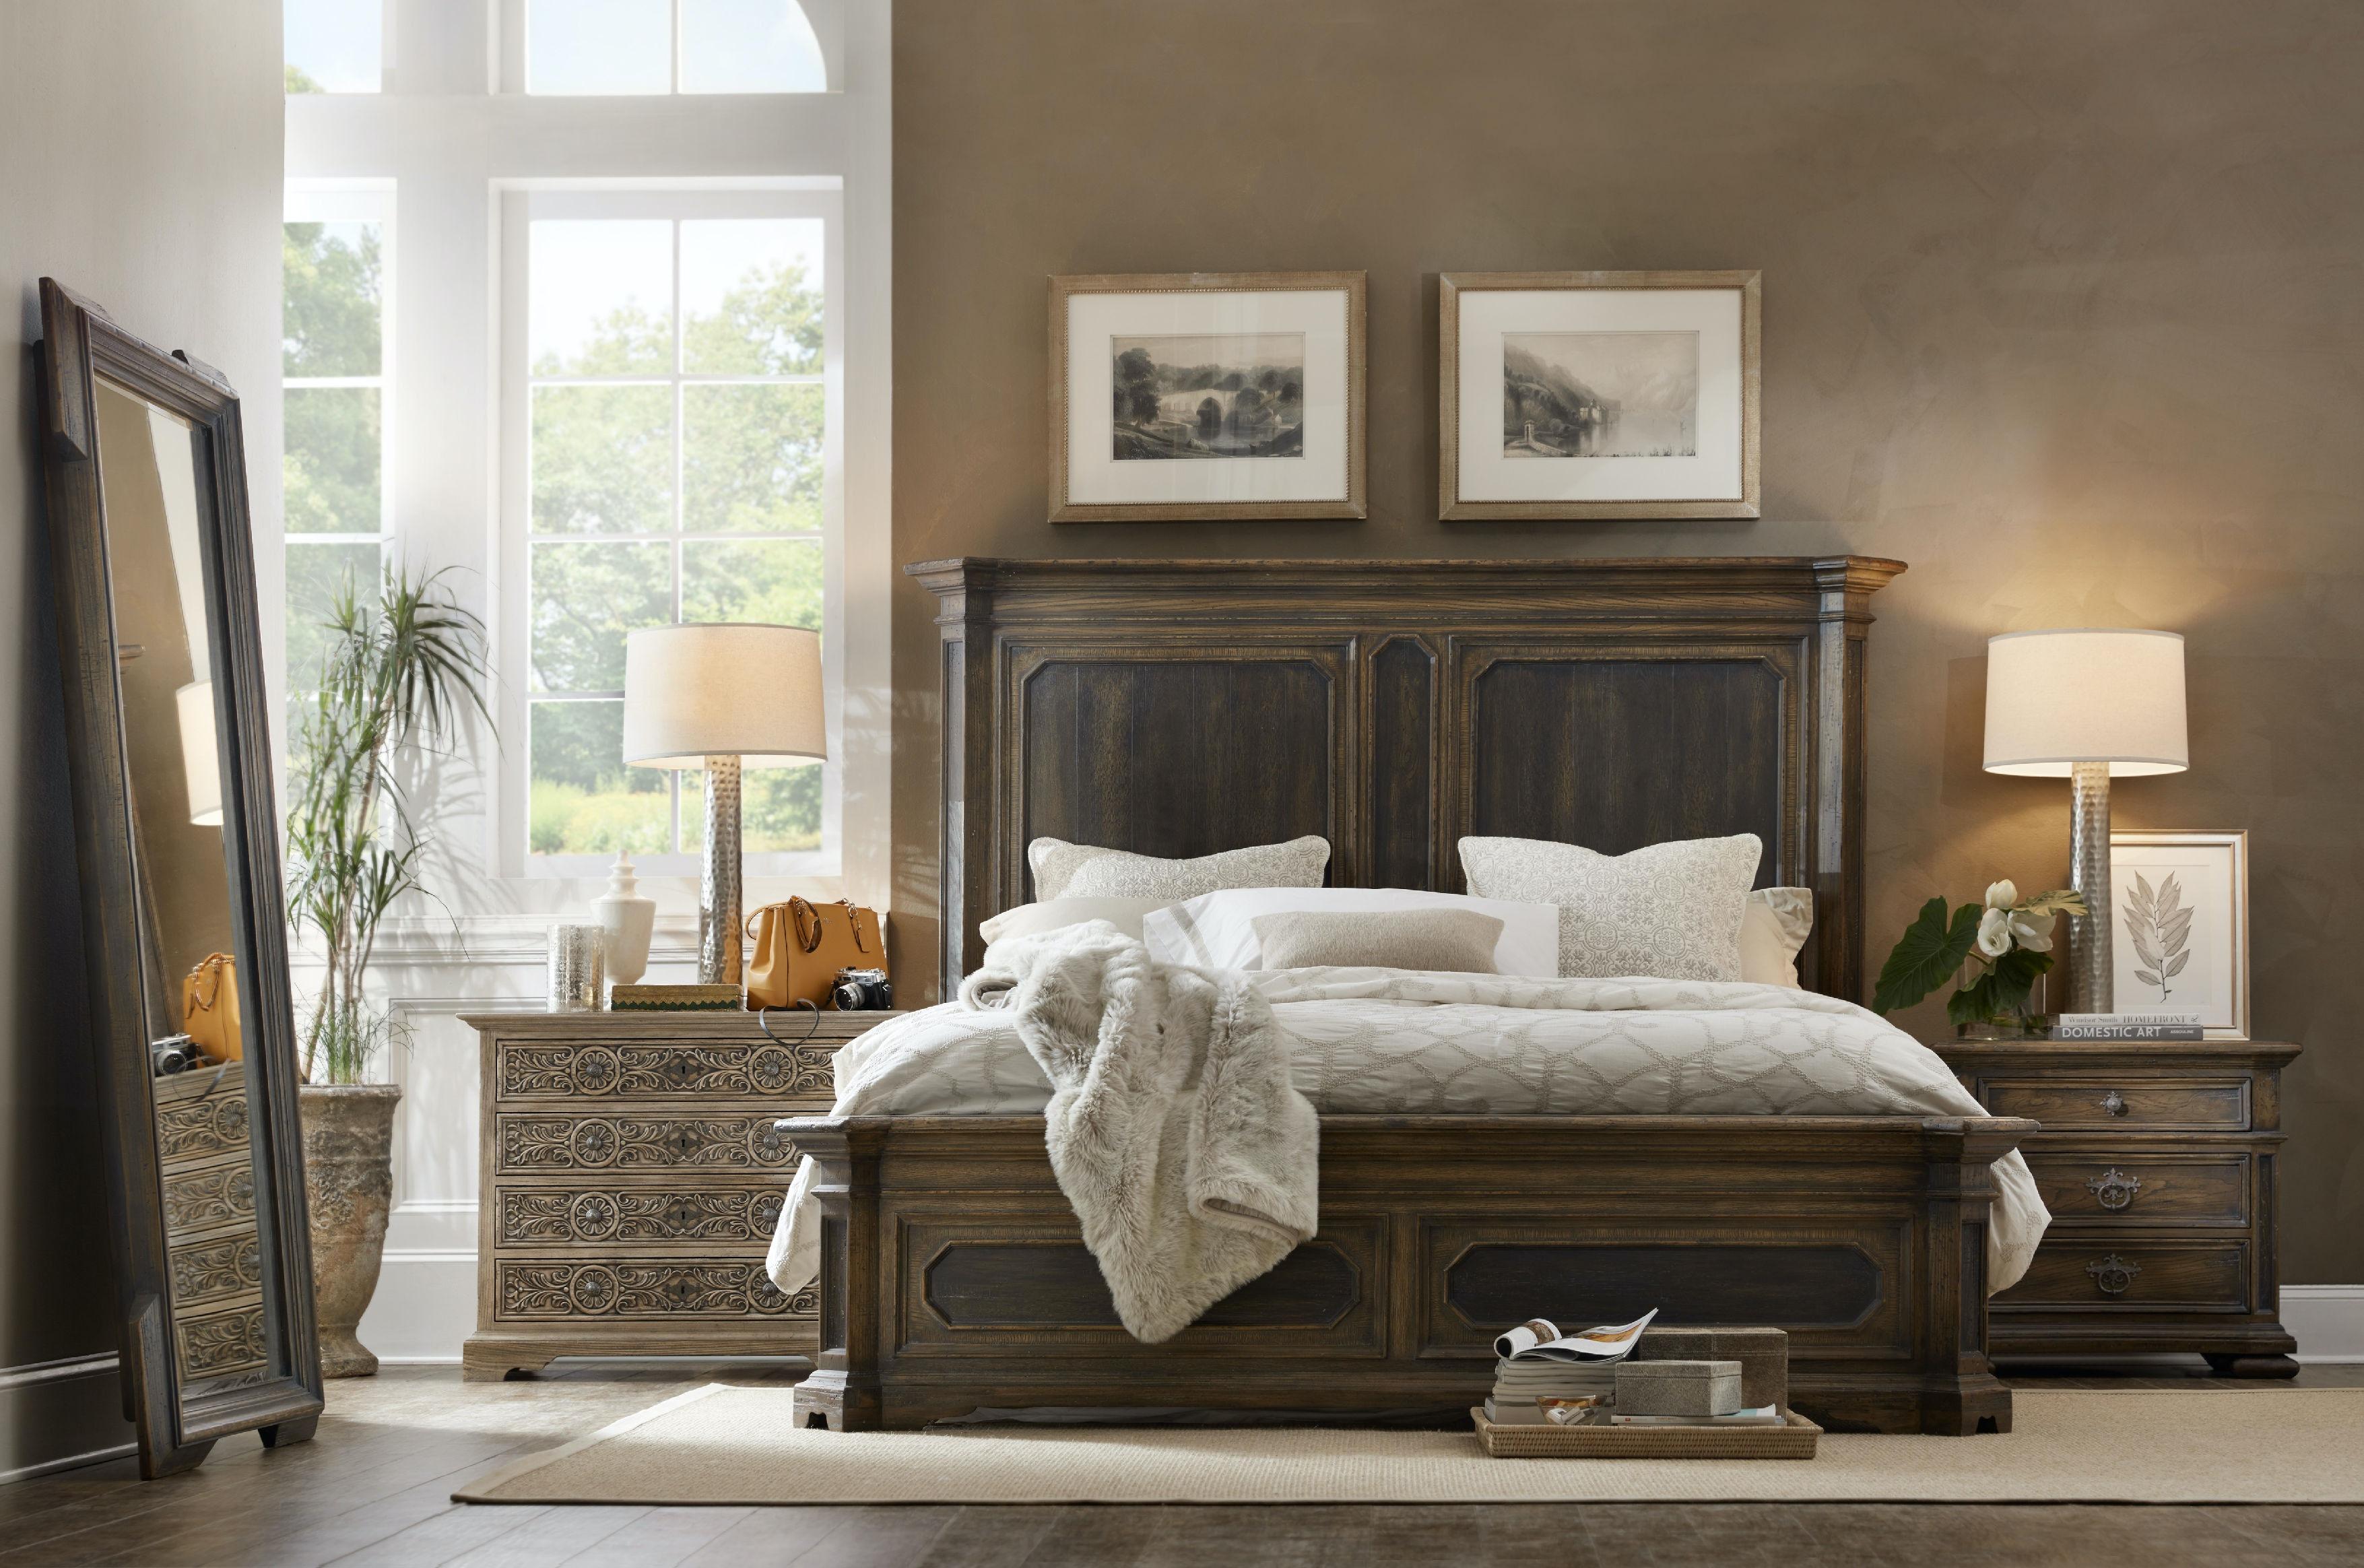 Good Hooker Furniture Woodcreek King Mansion Bed 5960 90266 MULTI